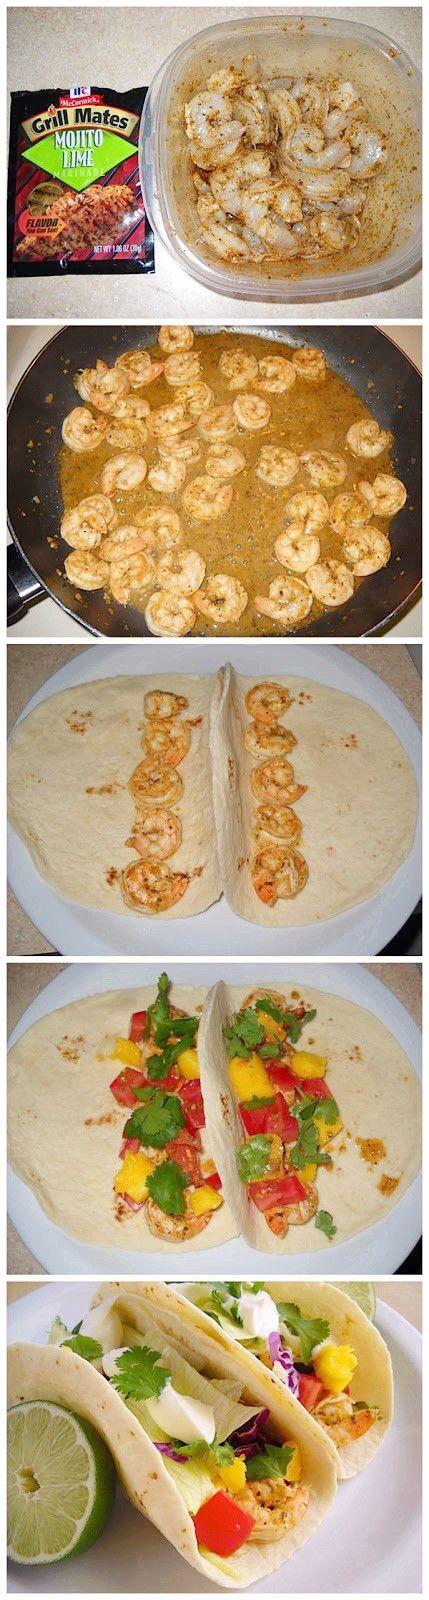 Super Simple Shrimp Tacos - Joybx